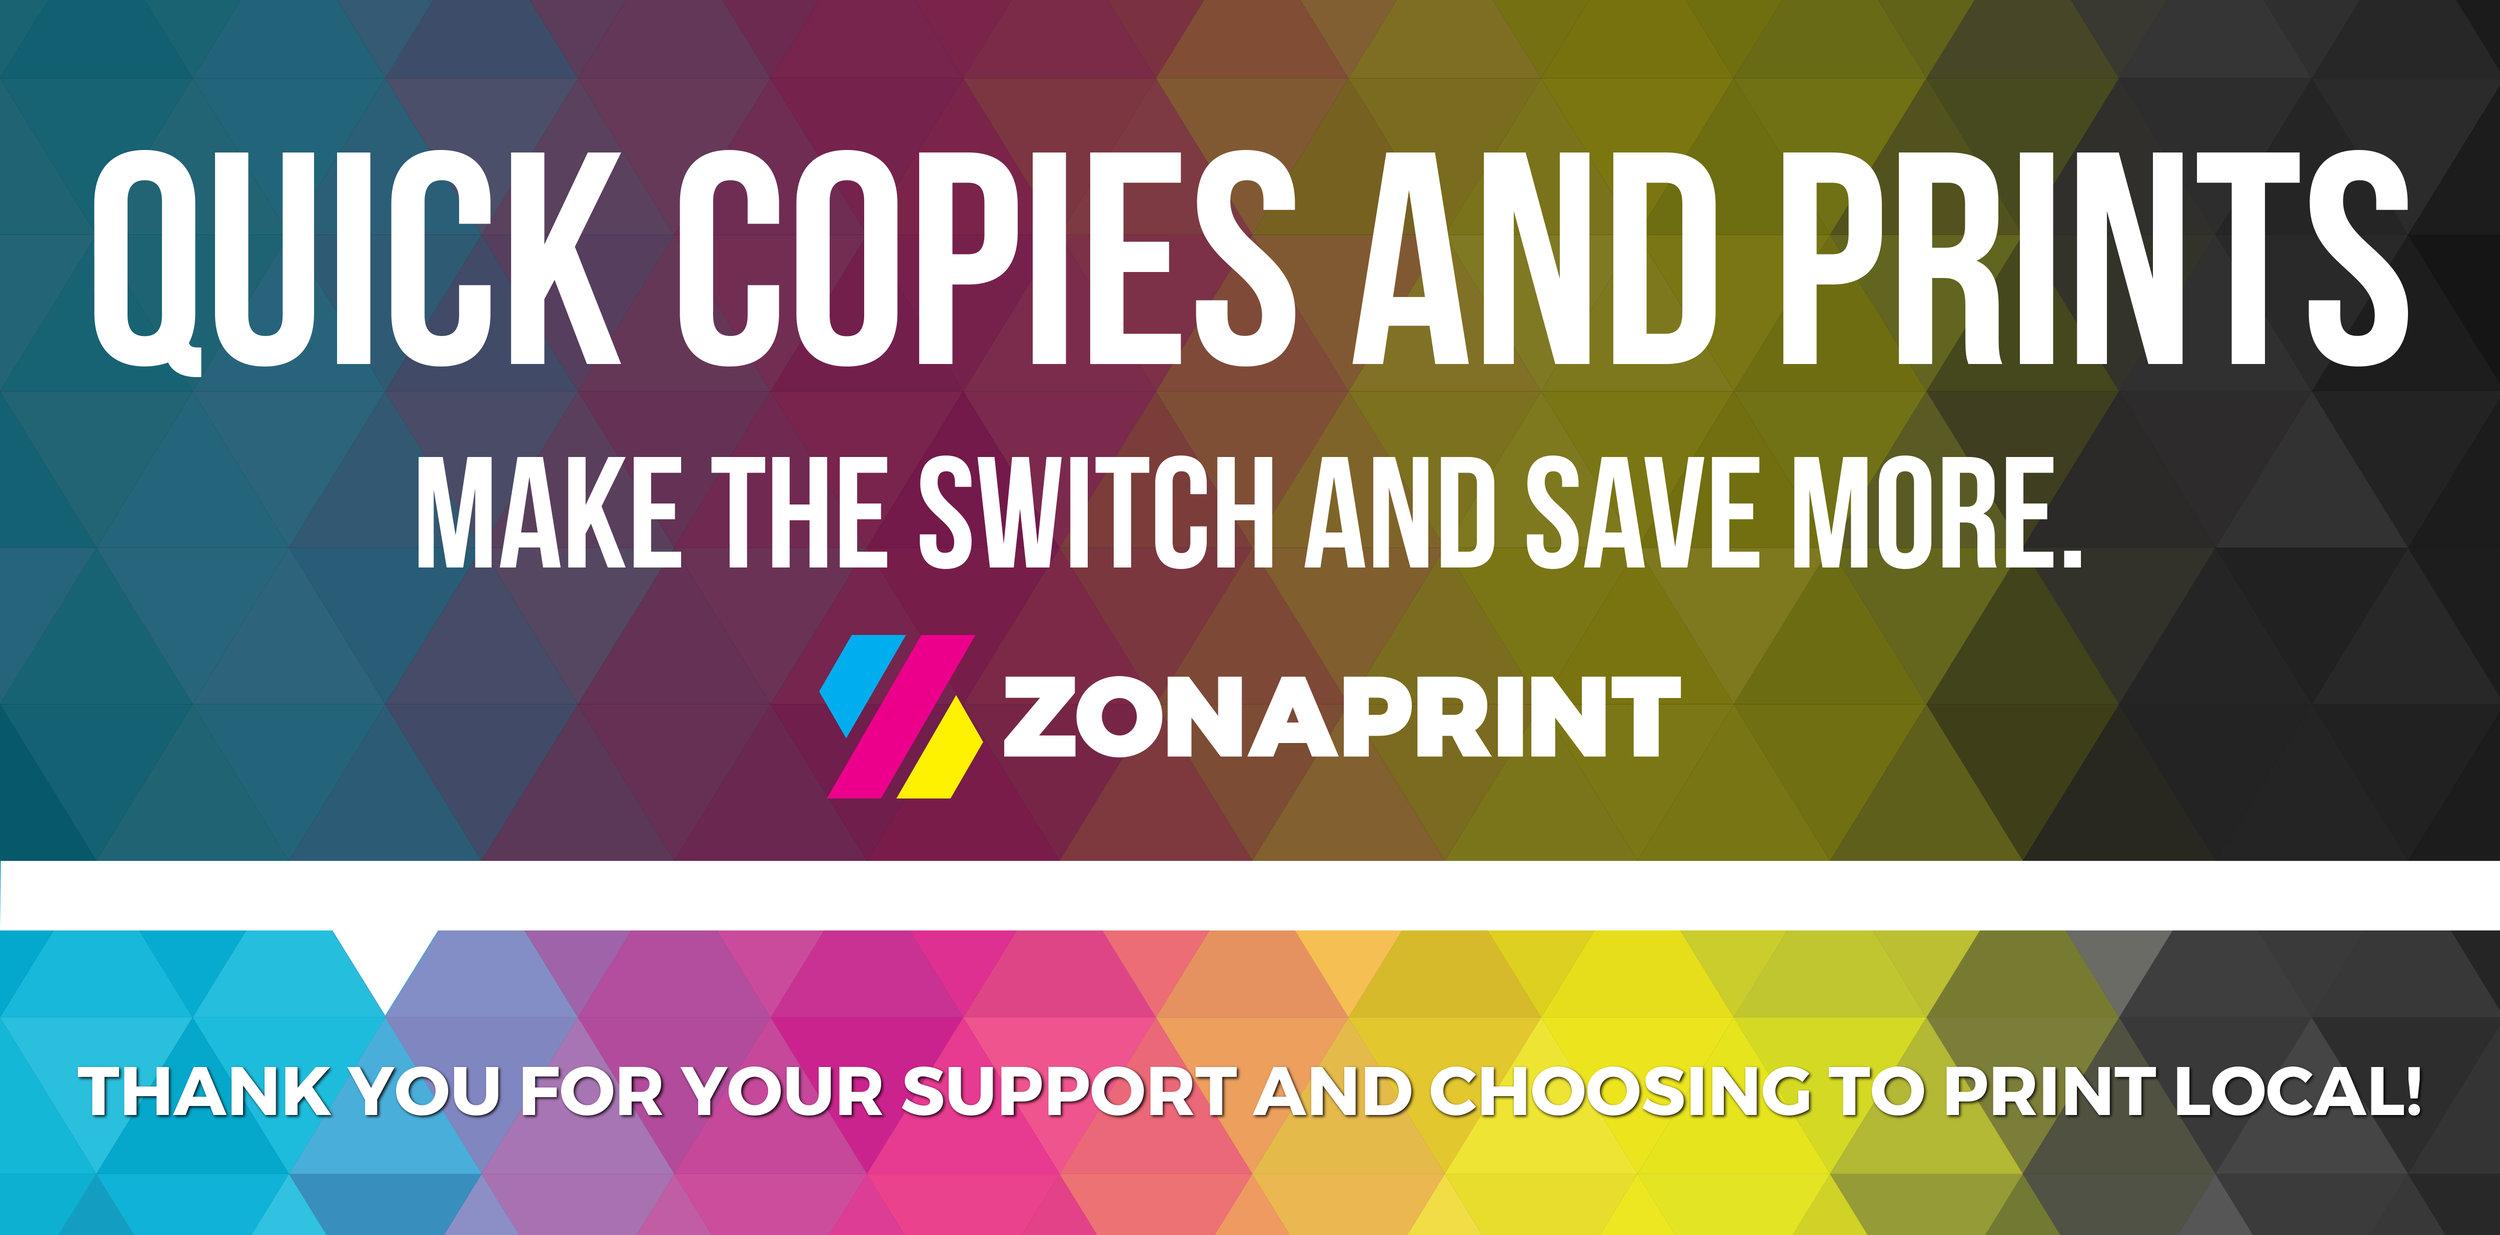 Quick Copies and Prints.jpg